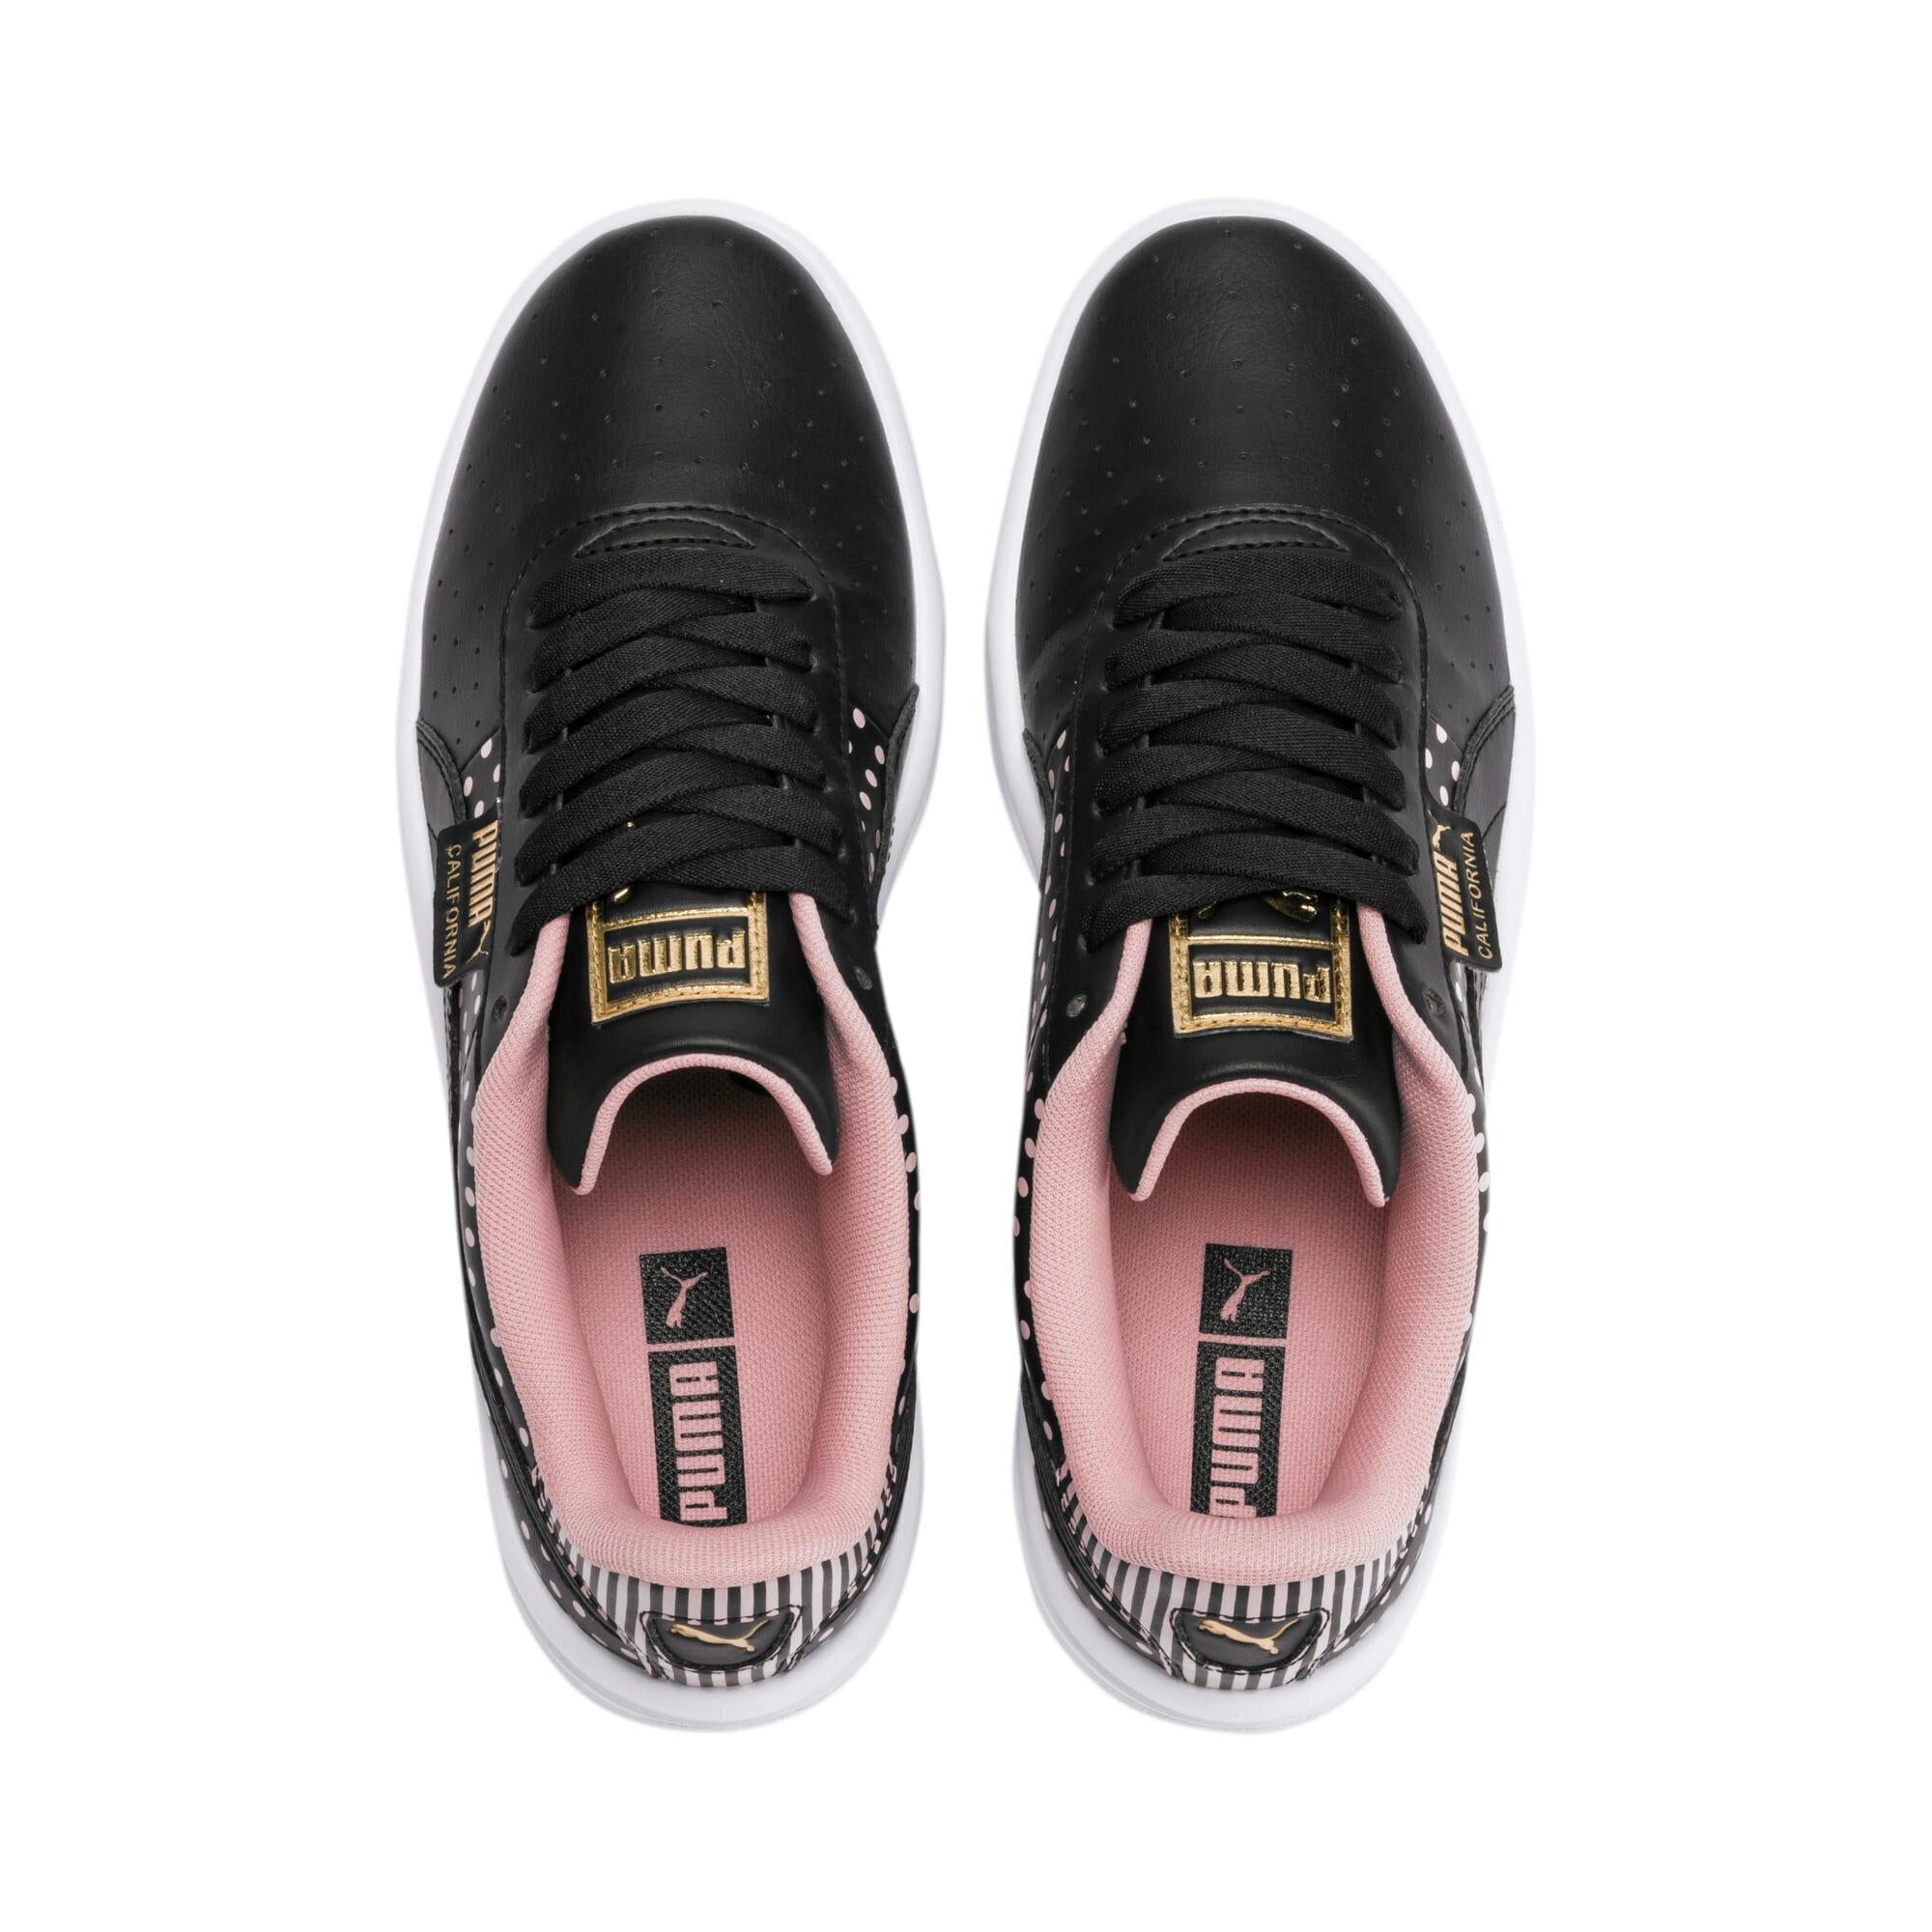 Thumbnail 7 of California Remix Women's Sneakers, Puma Black-Bridal Rose, medium